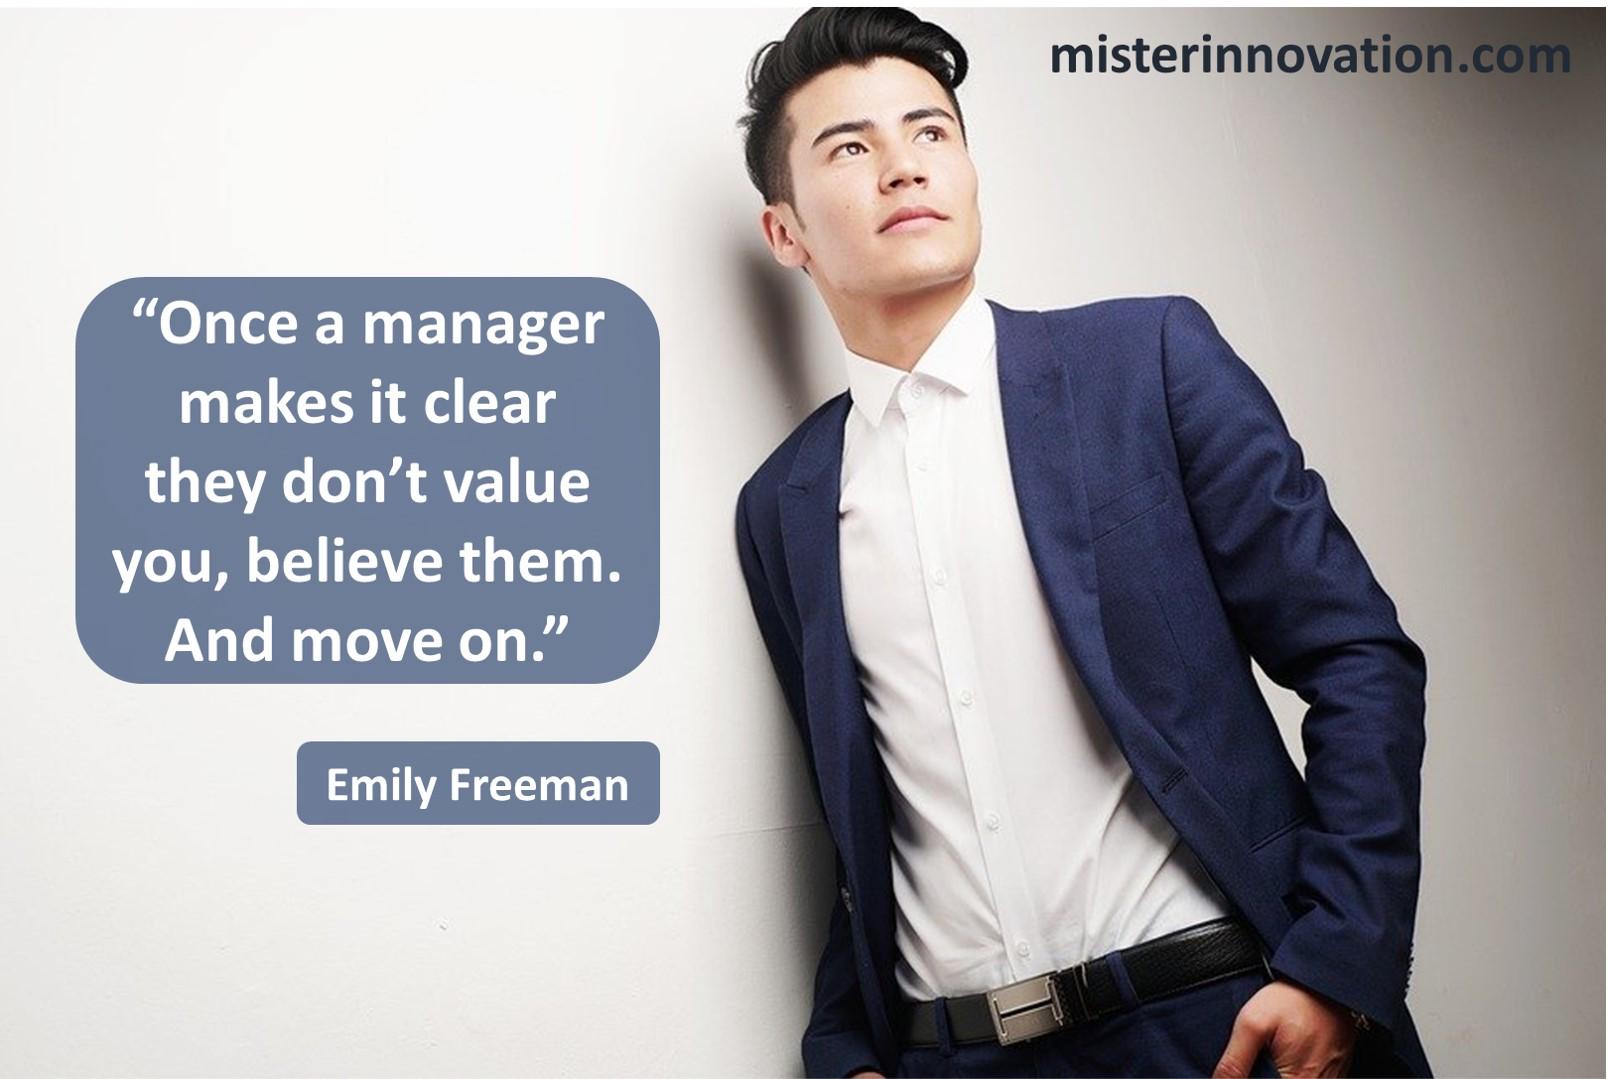 Emily Freeman